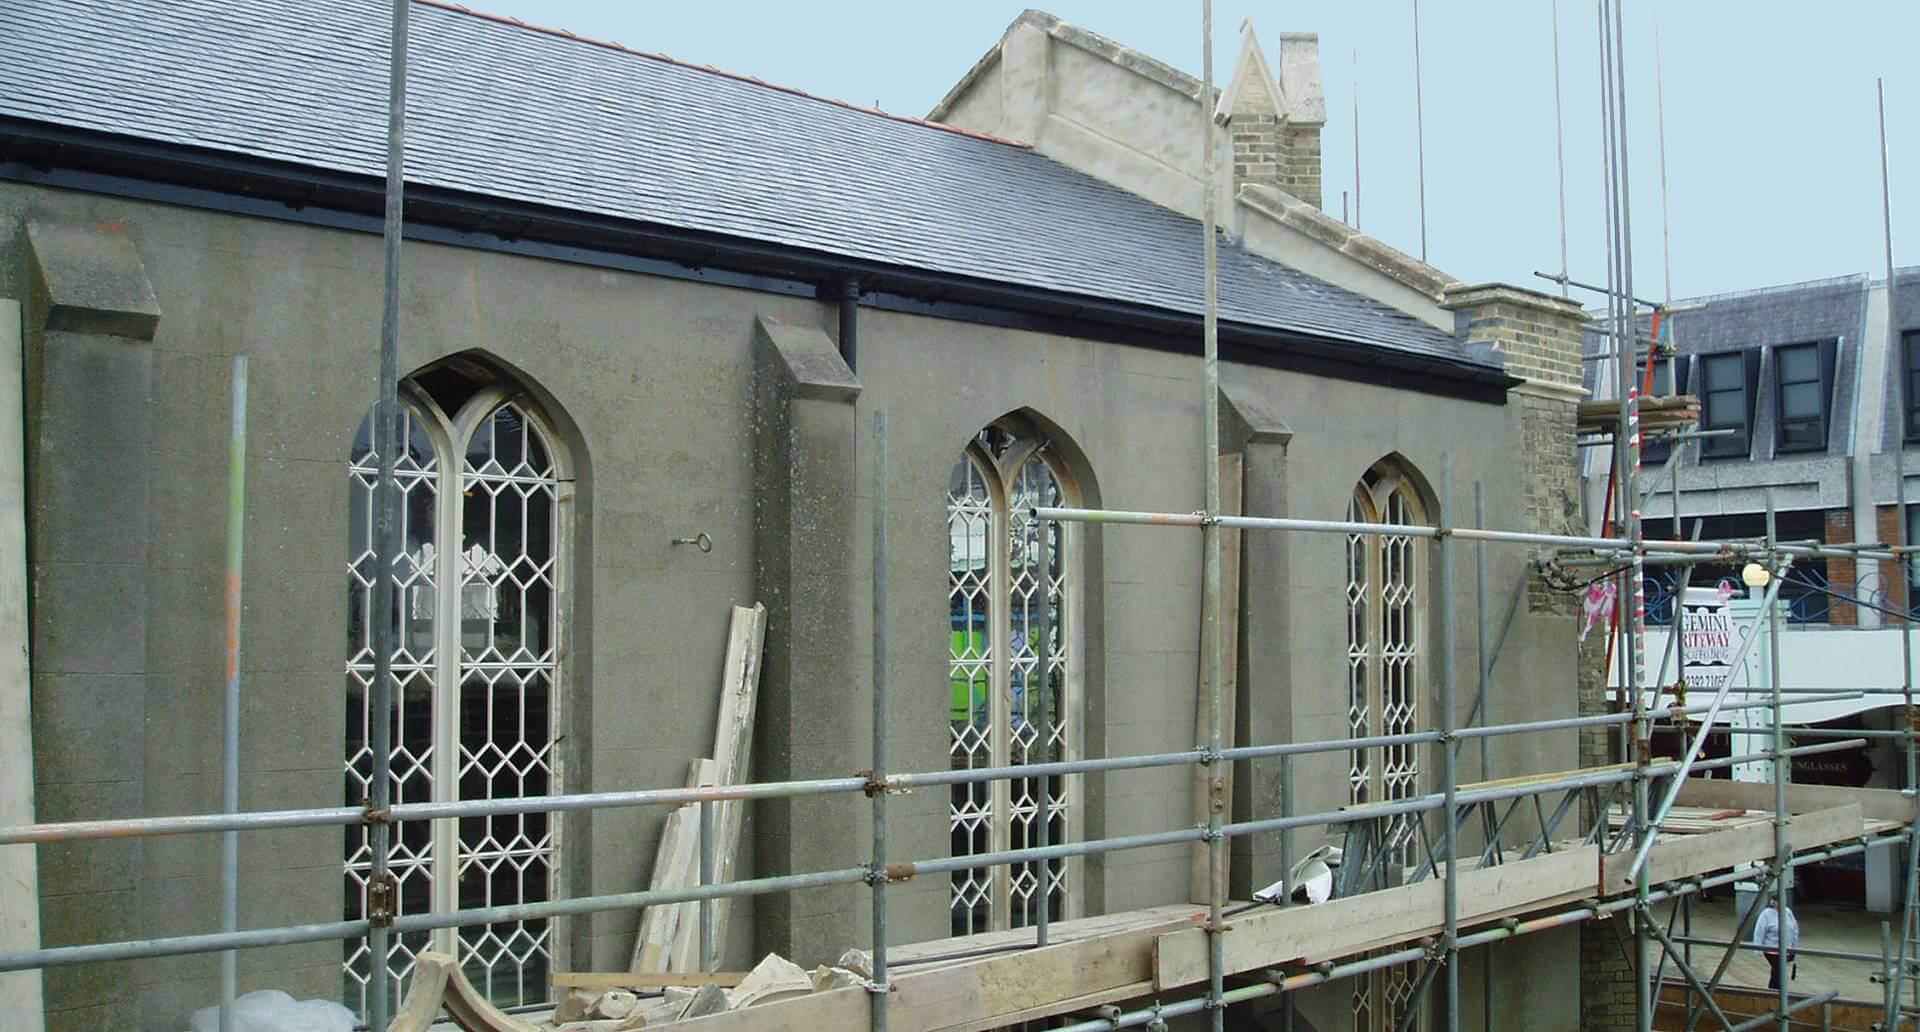 Portfolio - TKLS Architects, Otterbourne, Winchester, Hampshire, UK